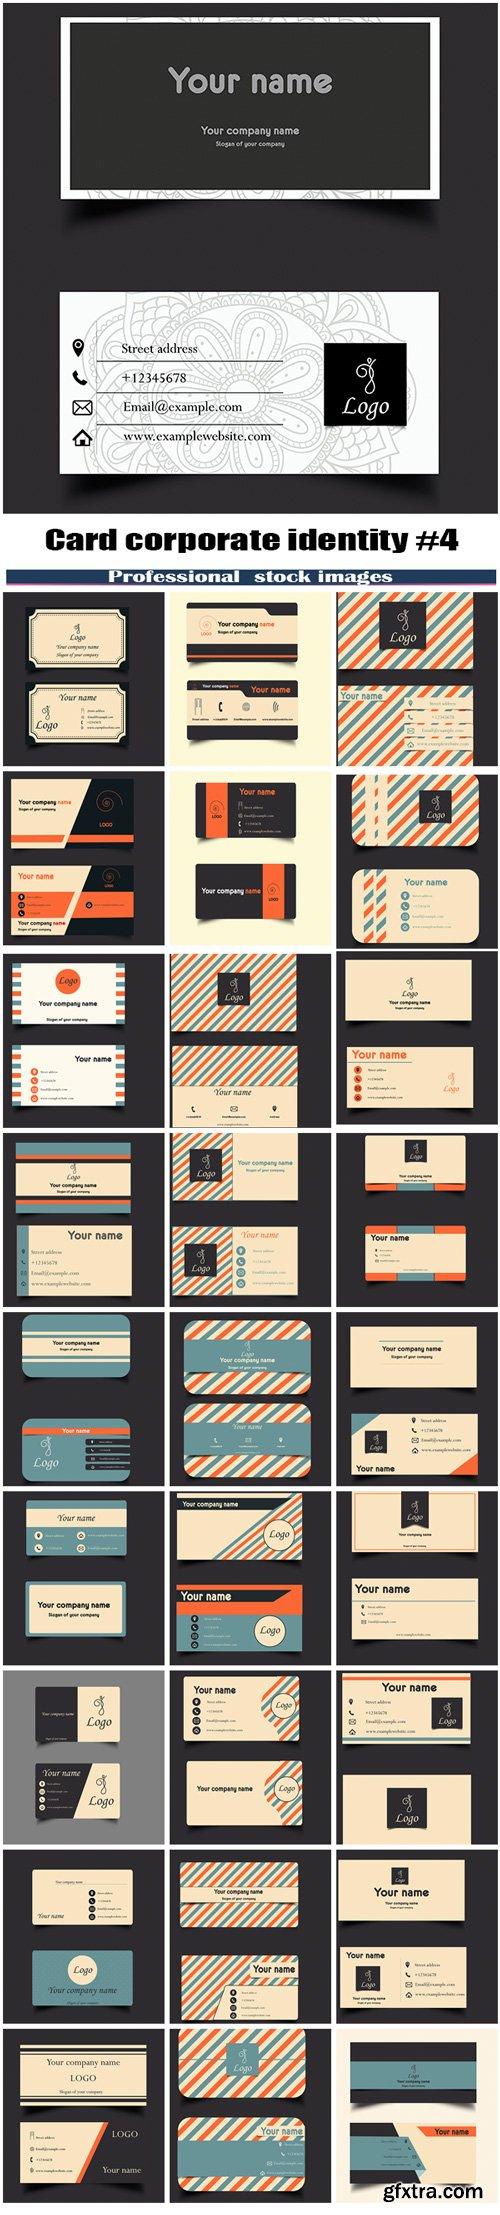 Card corporate identity #4